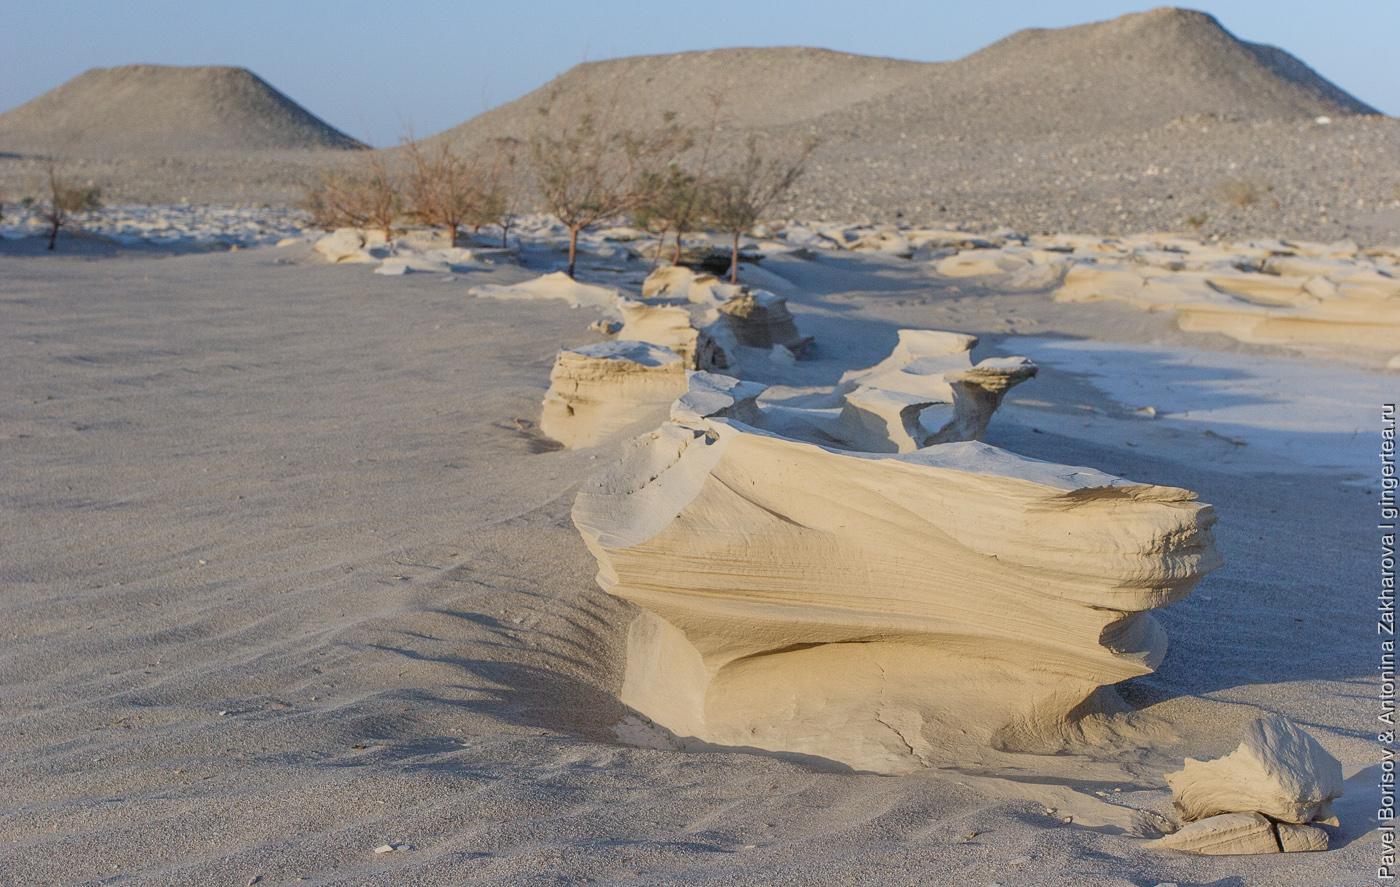 китайская пустыня Такла-Макан